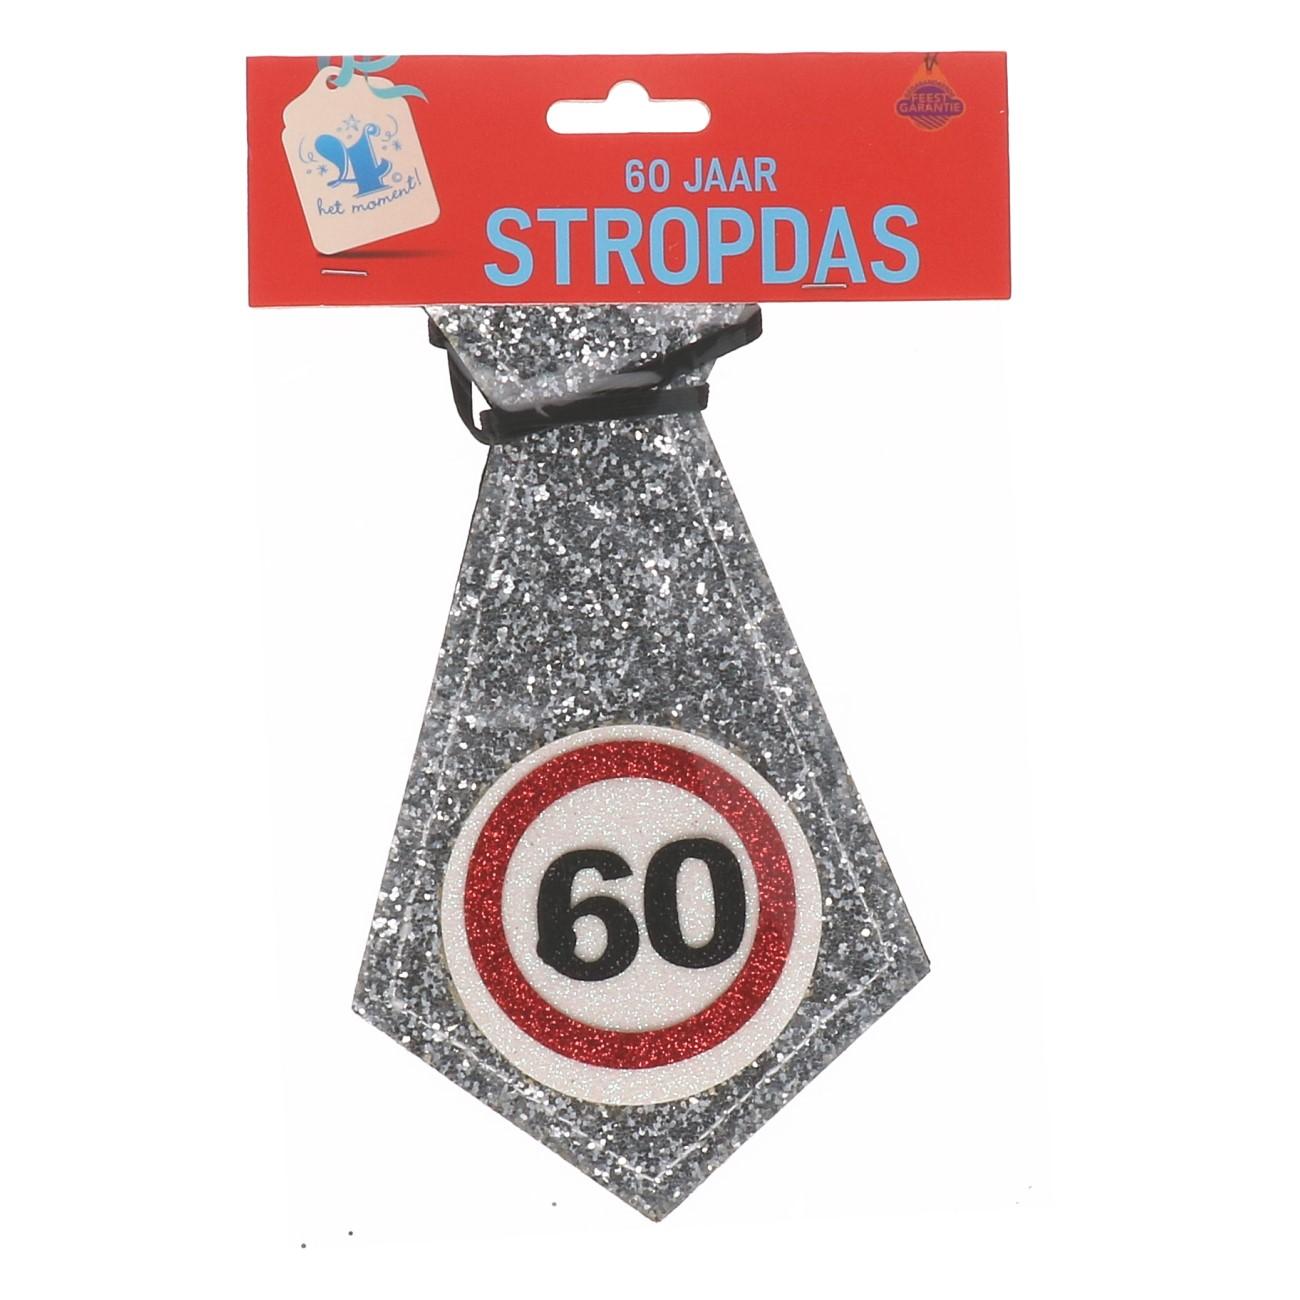 Glitter stropdas 60 jaar